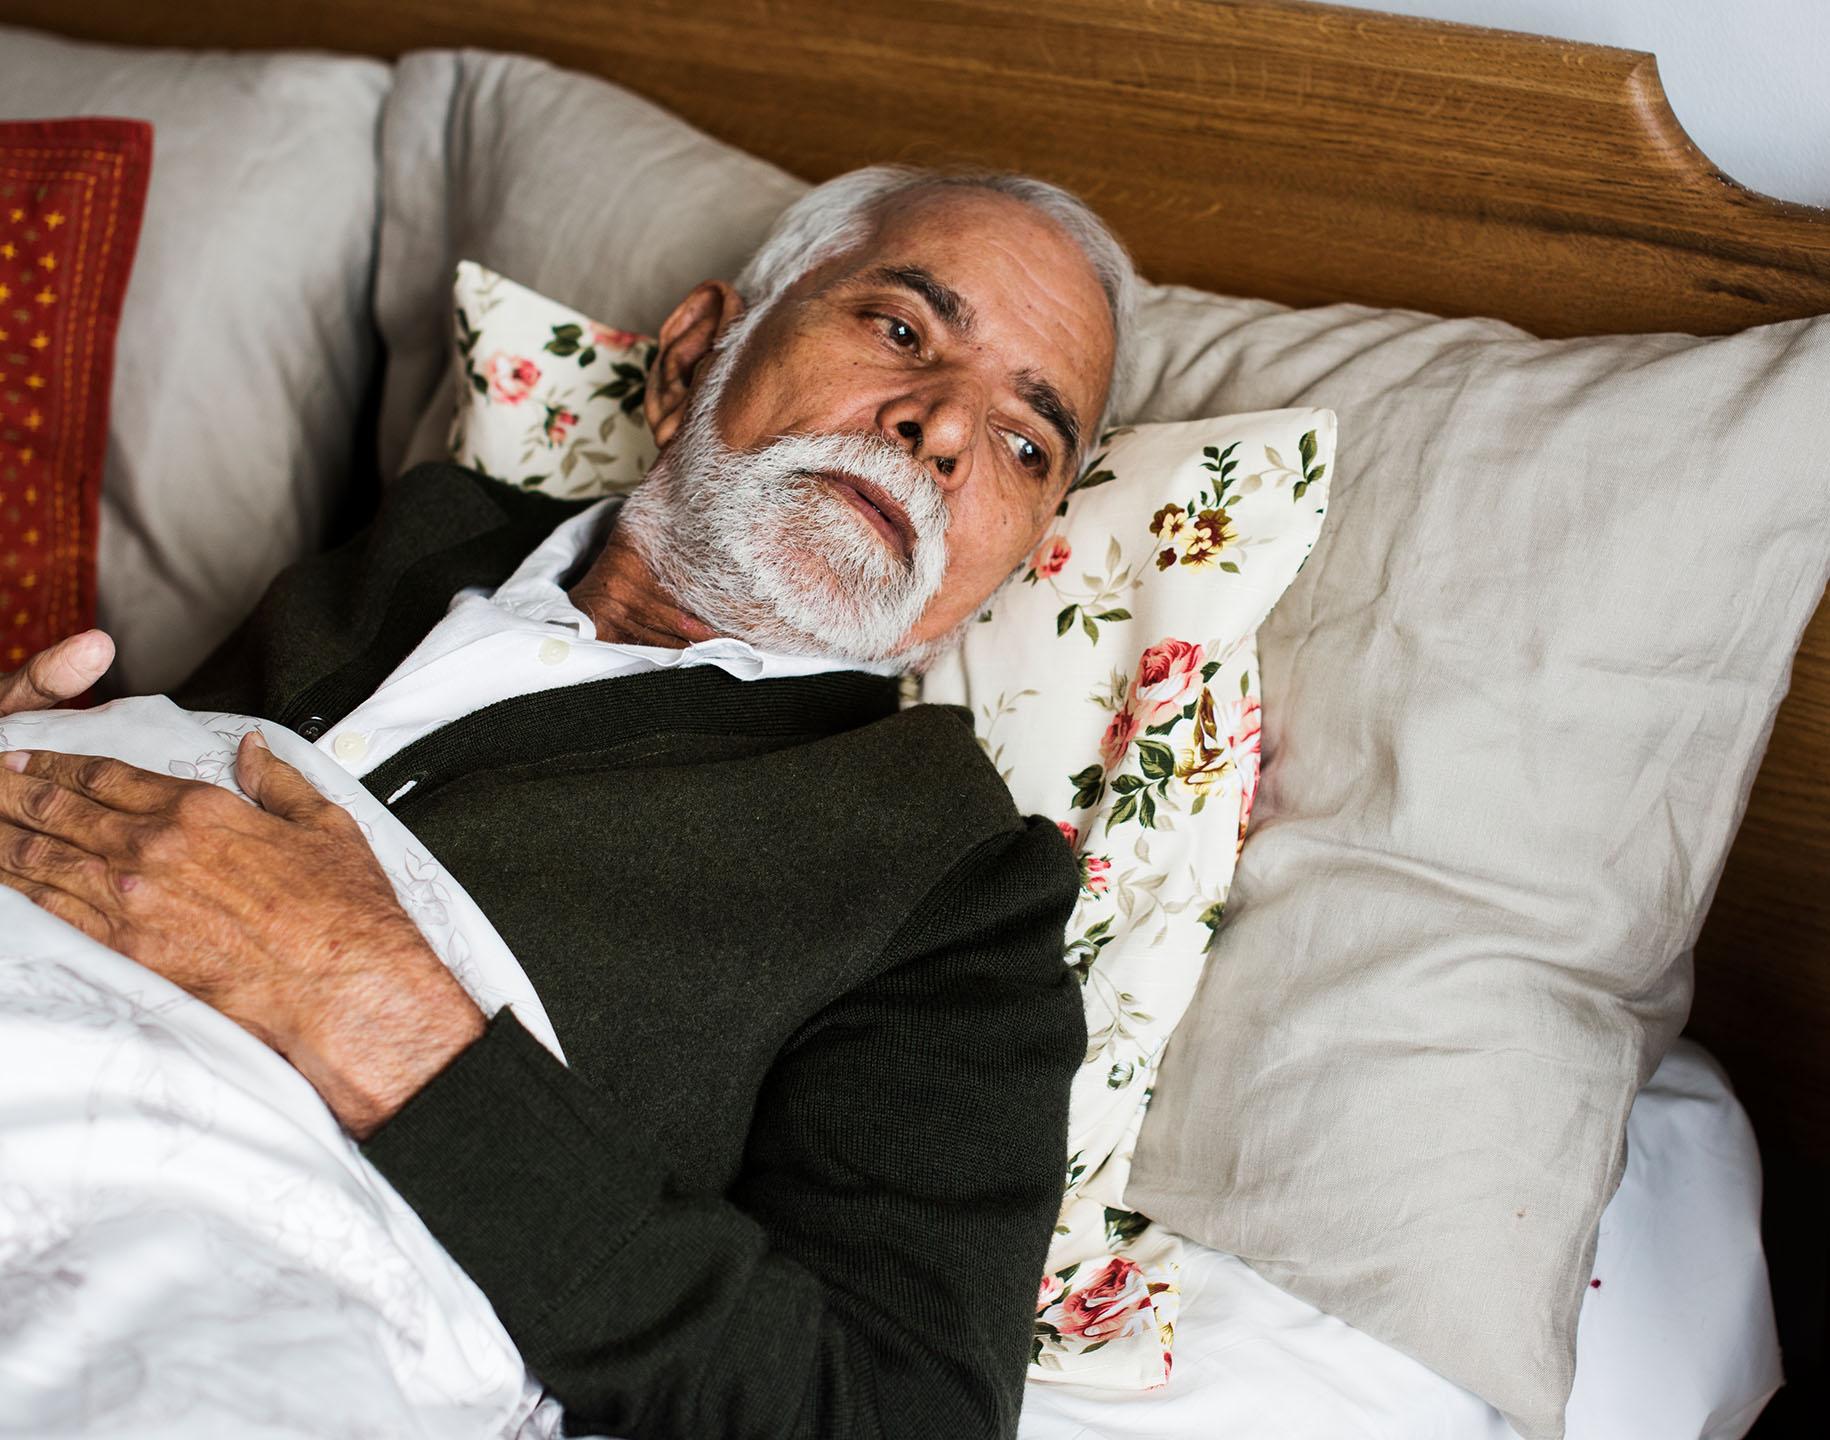 Bedsores In Nursing Homes (Updated July 2021)